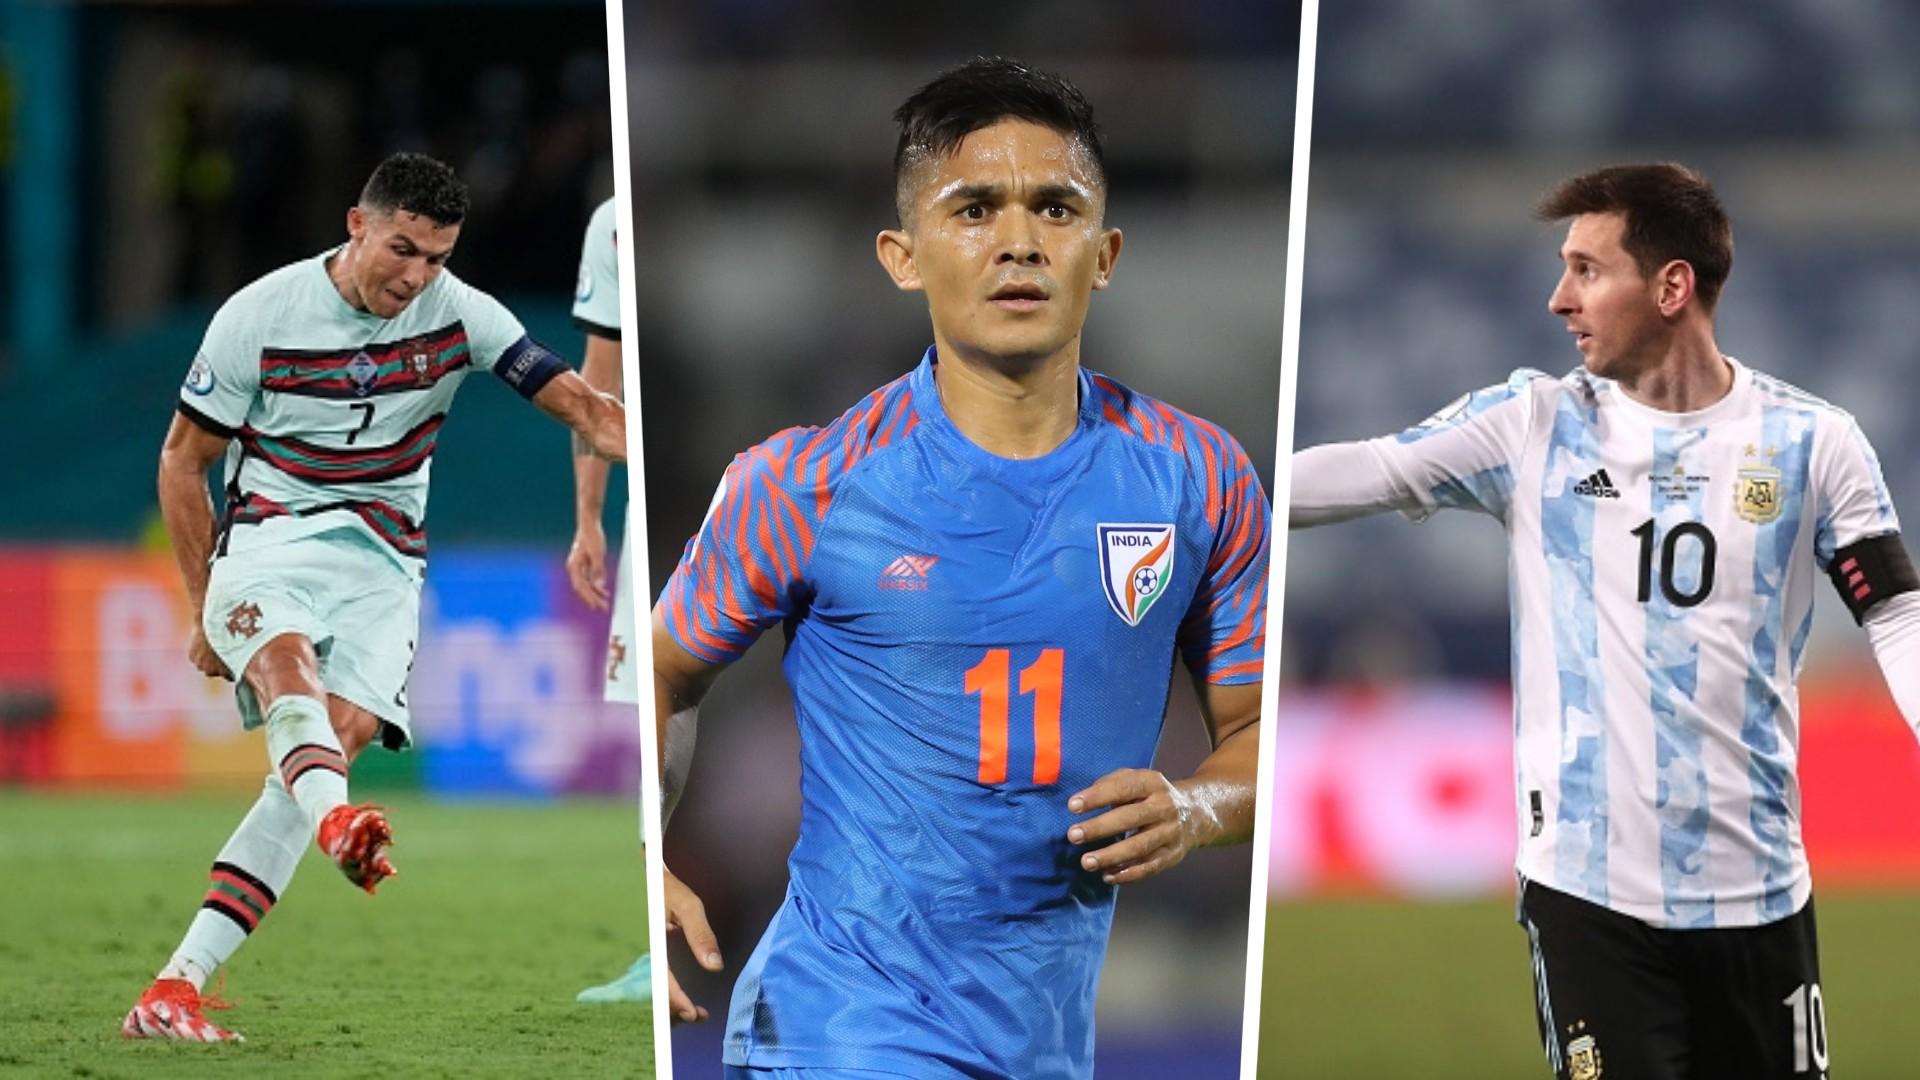 Lionel Messi surpasses Sunil Chhetri's international goals tally! Where does he rank in all-time goalscorers list?